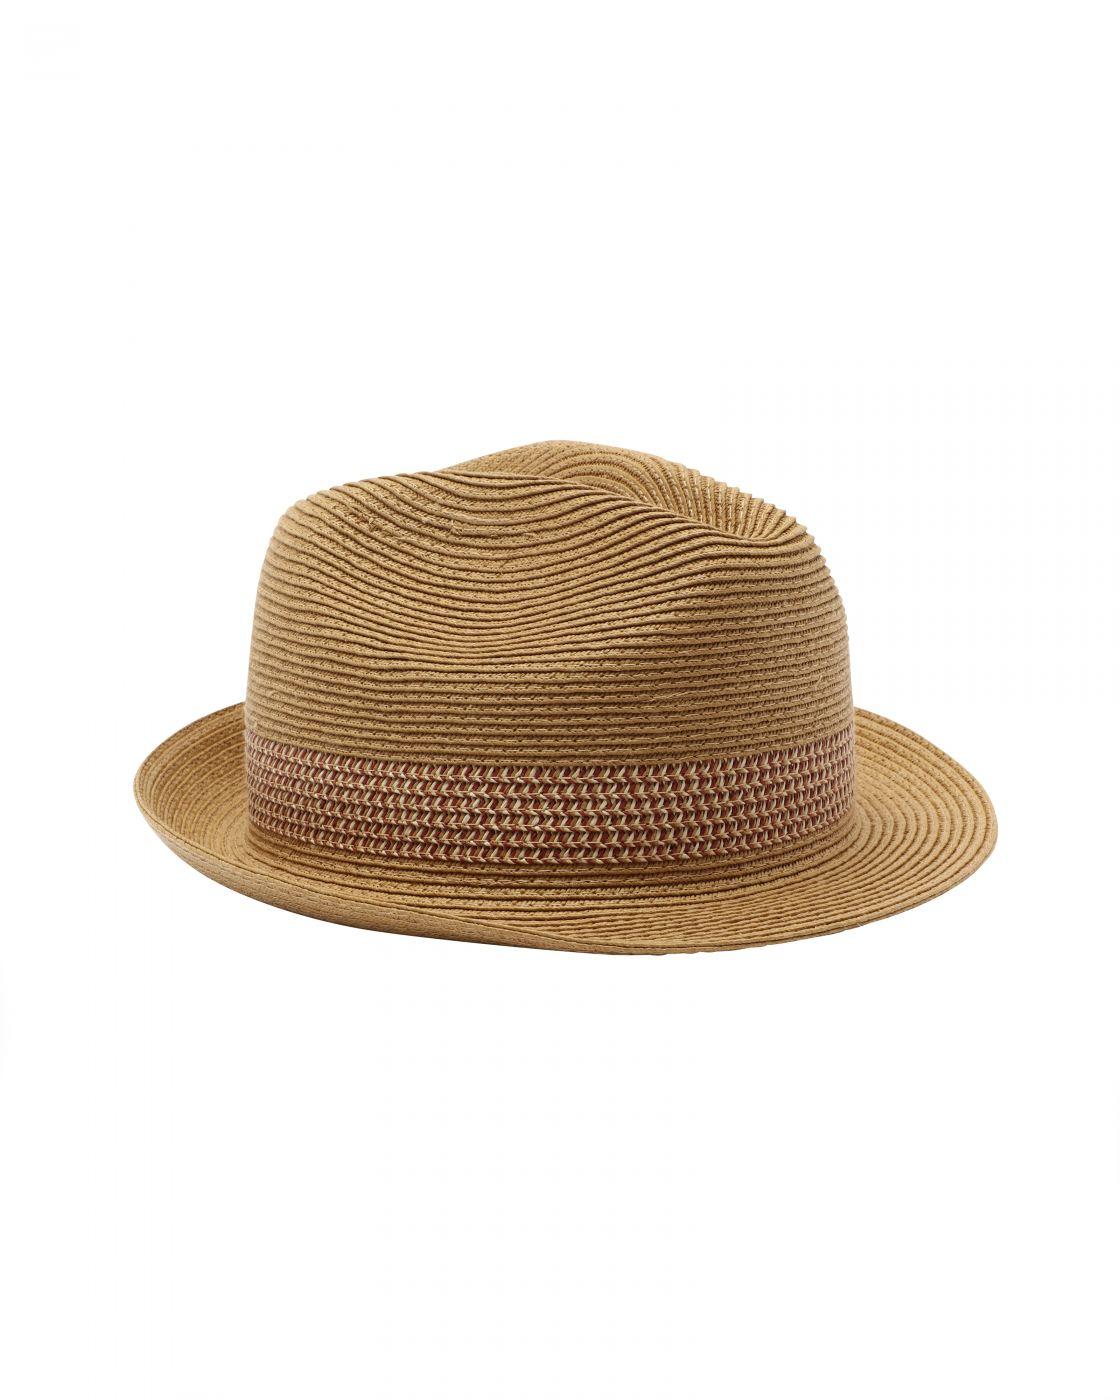 1baa4b4986f1d TED BAKER LONDON LEMONY NATURAL STRAW TRILBY HAT